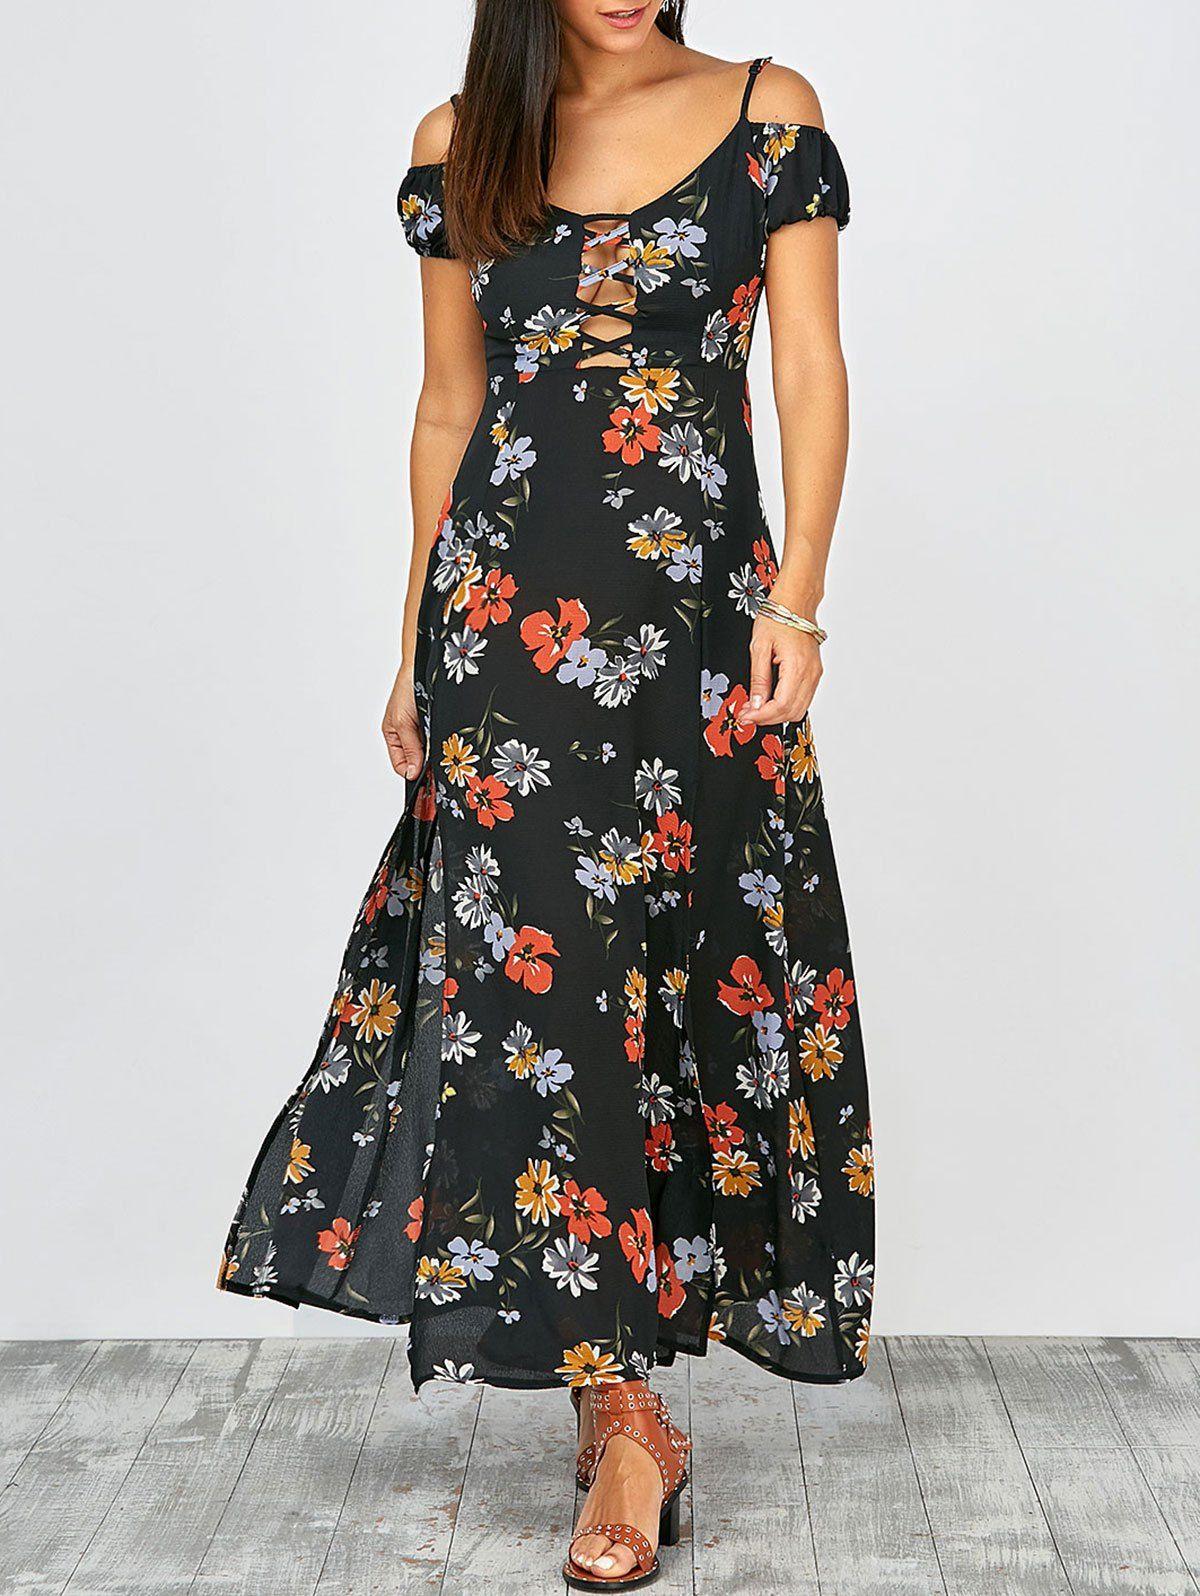 High split lace up floral maxi dress in multi sammydress